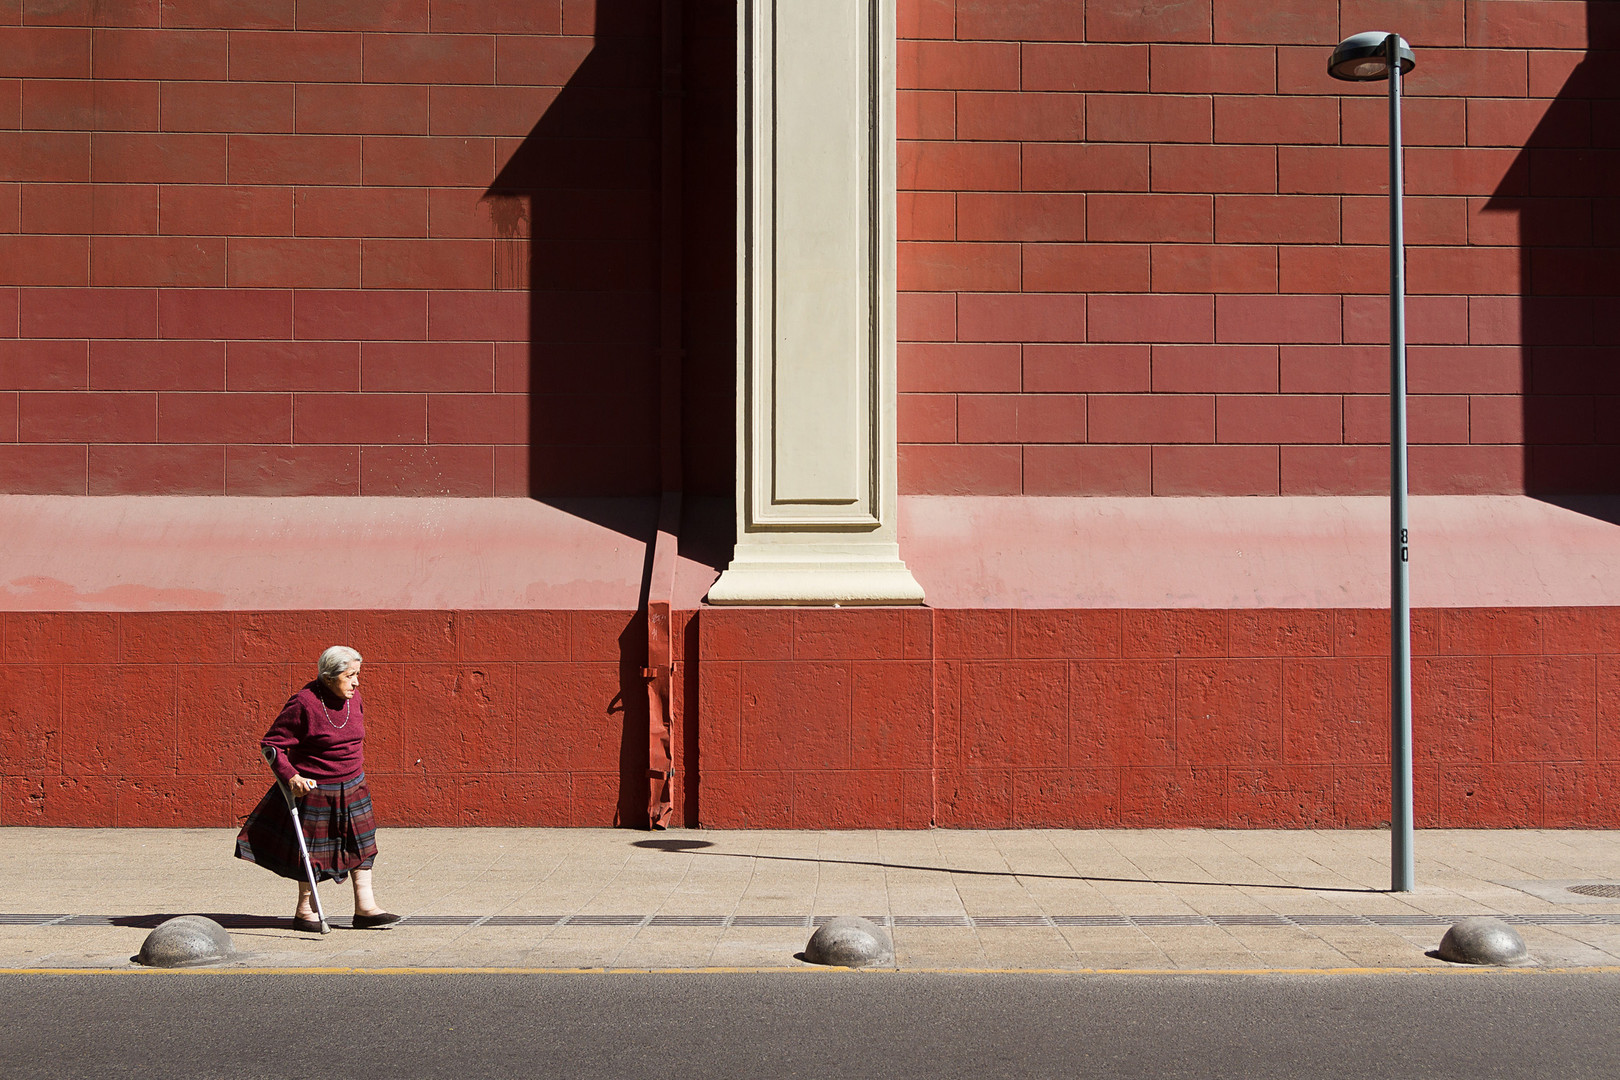 La abuela afuera de la iglesia